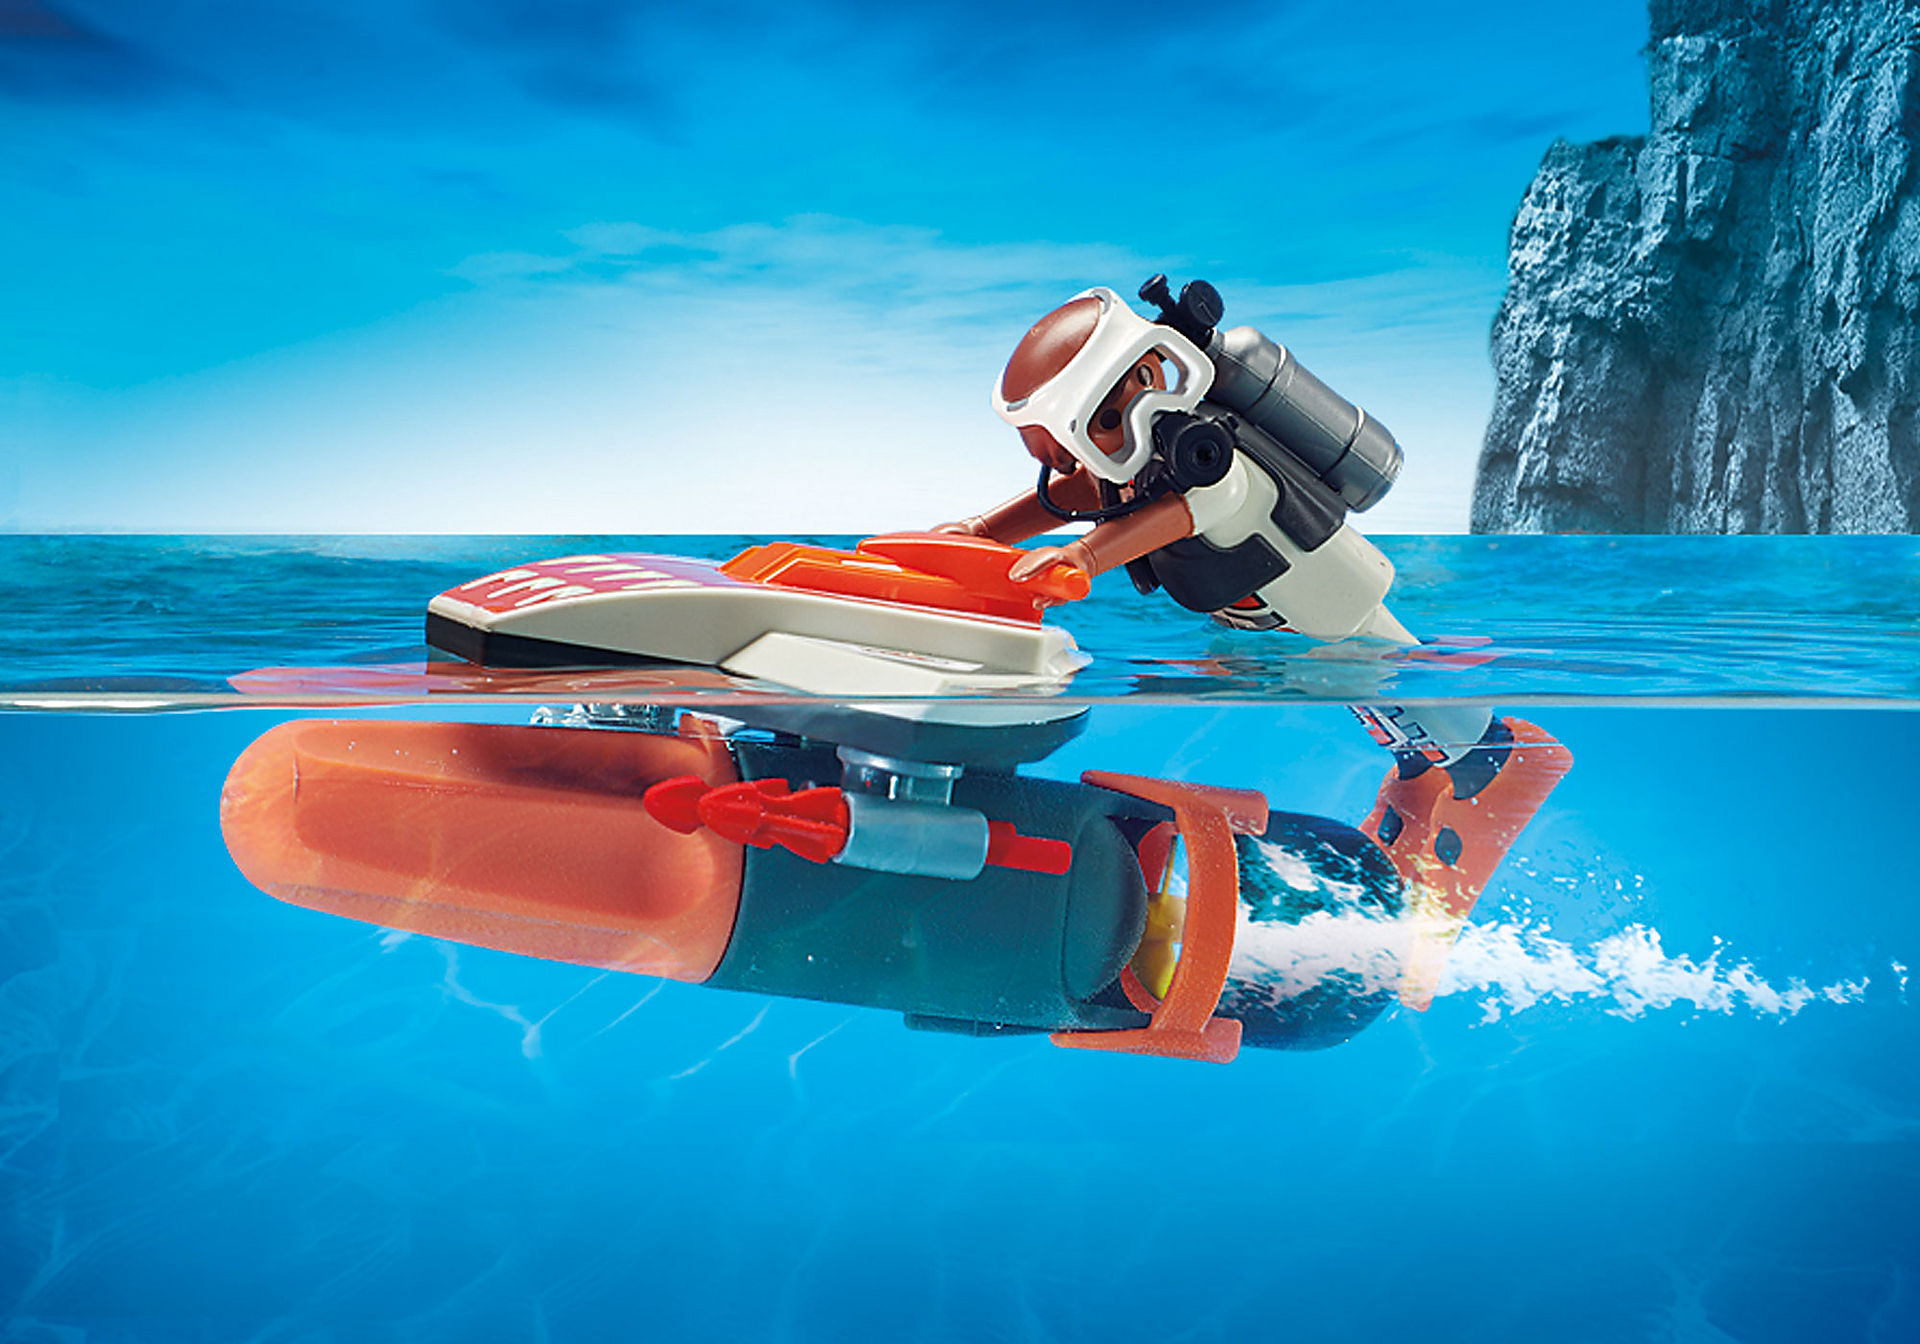 70004 SPY TEAM Pojazd podwodny z napędem zoom image5